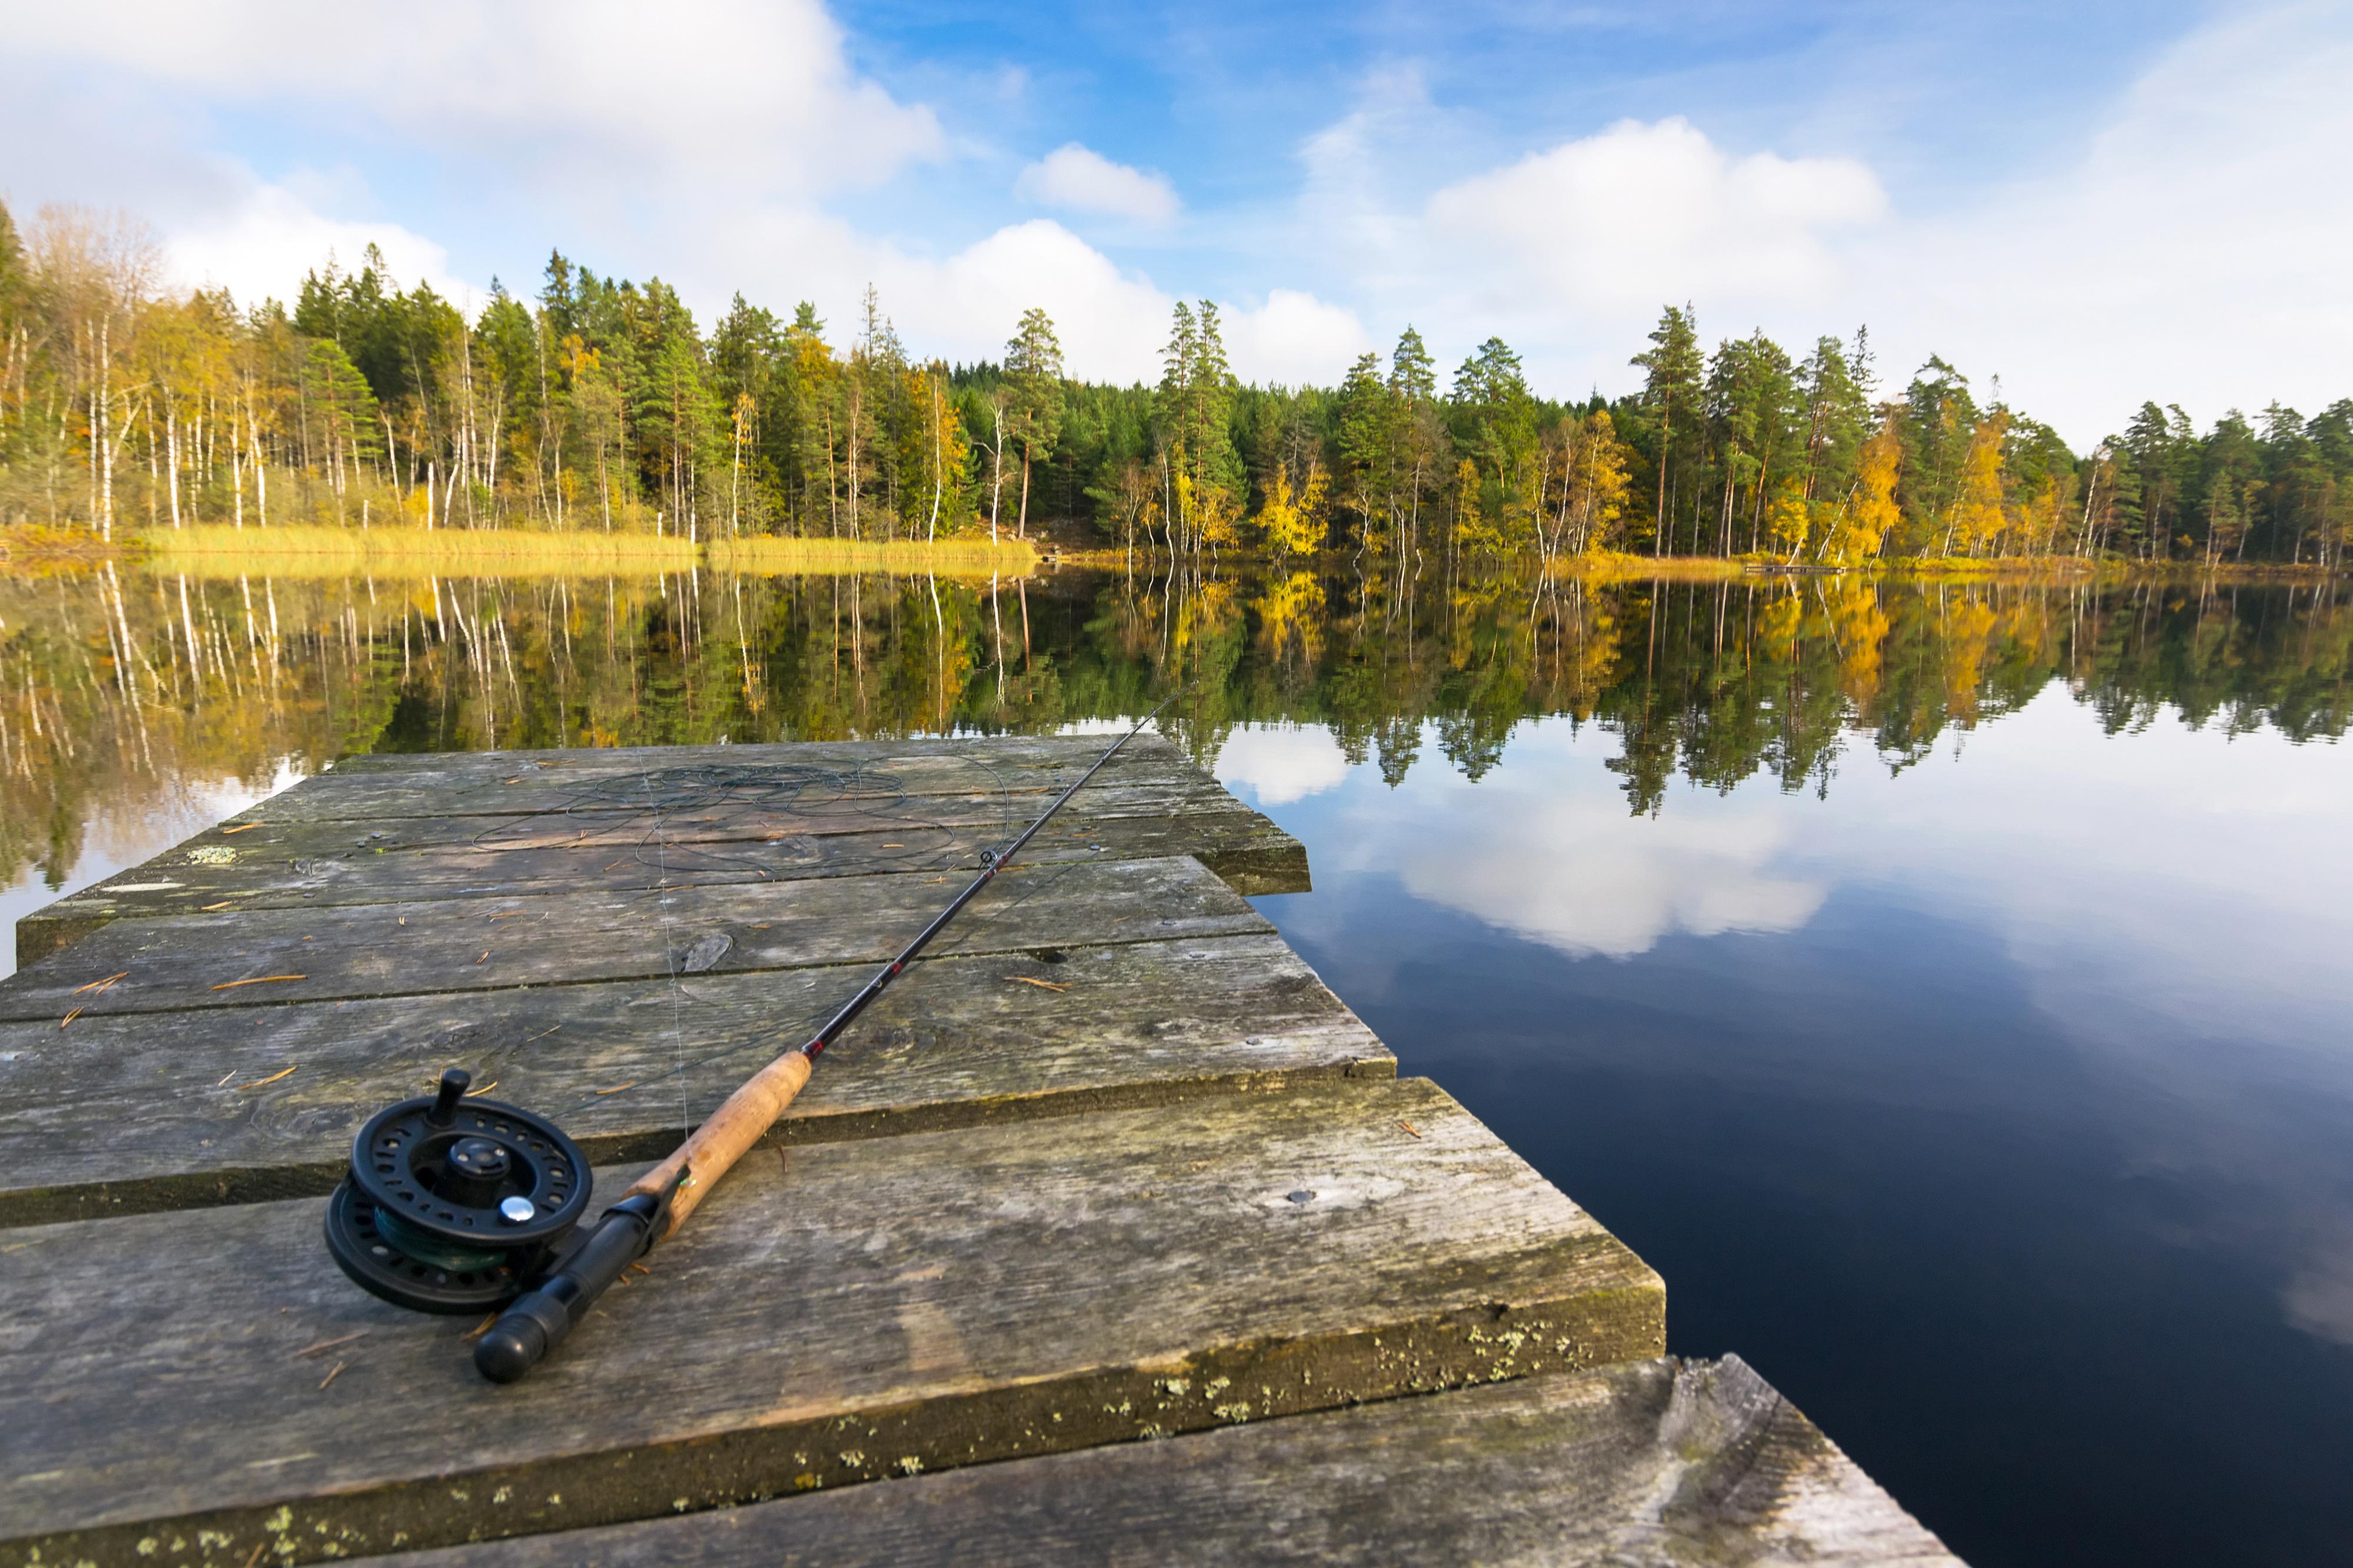 Melinda V Lee - Fly Fishing in Winter Park, CO